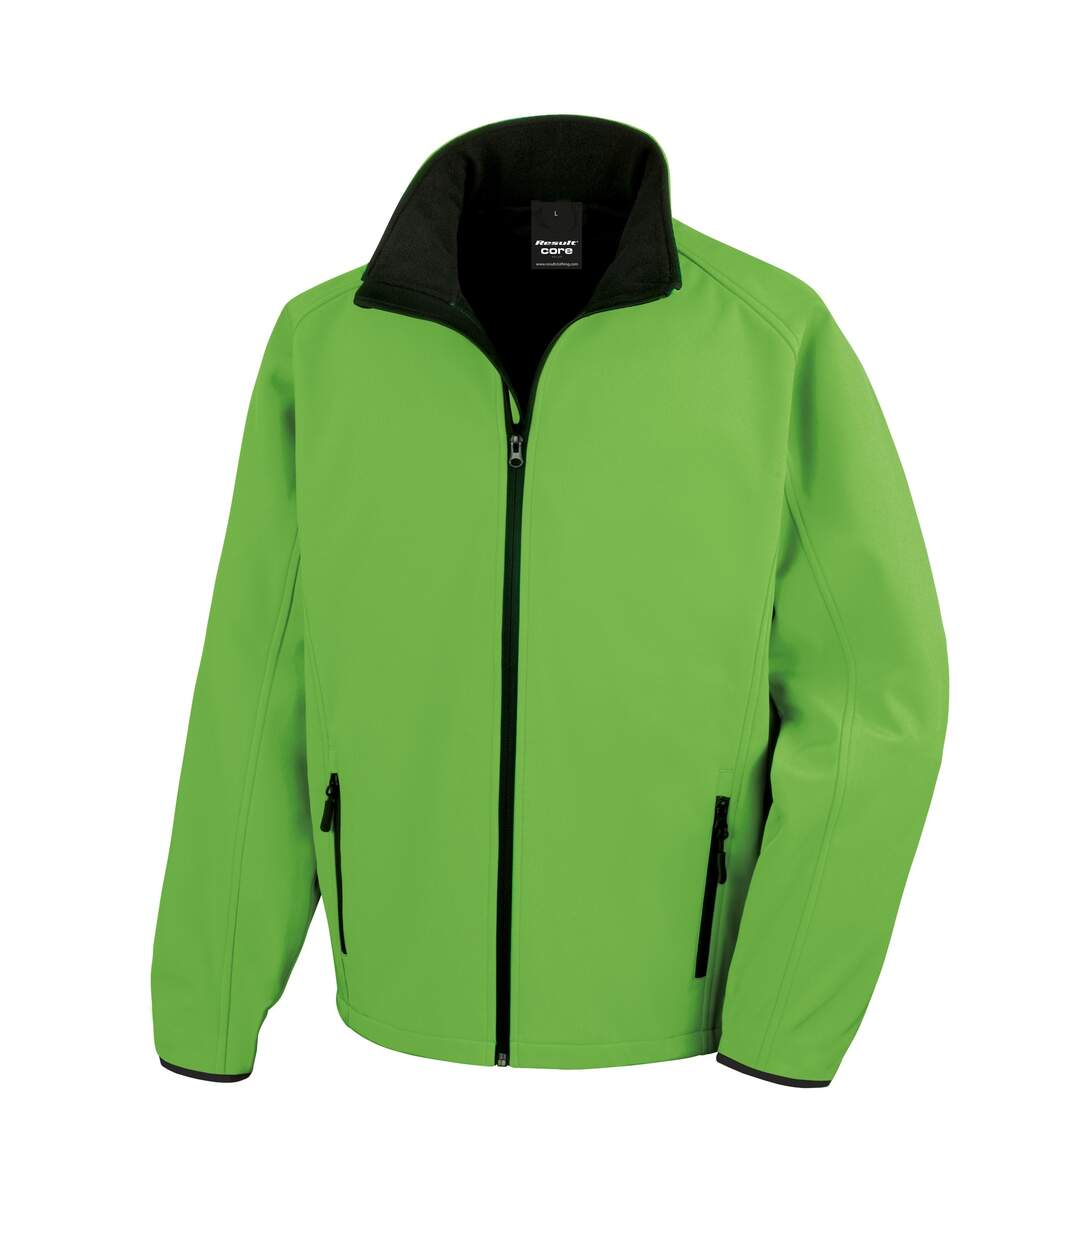 Result Mens Core Printable Softshell Jacket (Vivid Green / Black) - UTRW3697